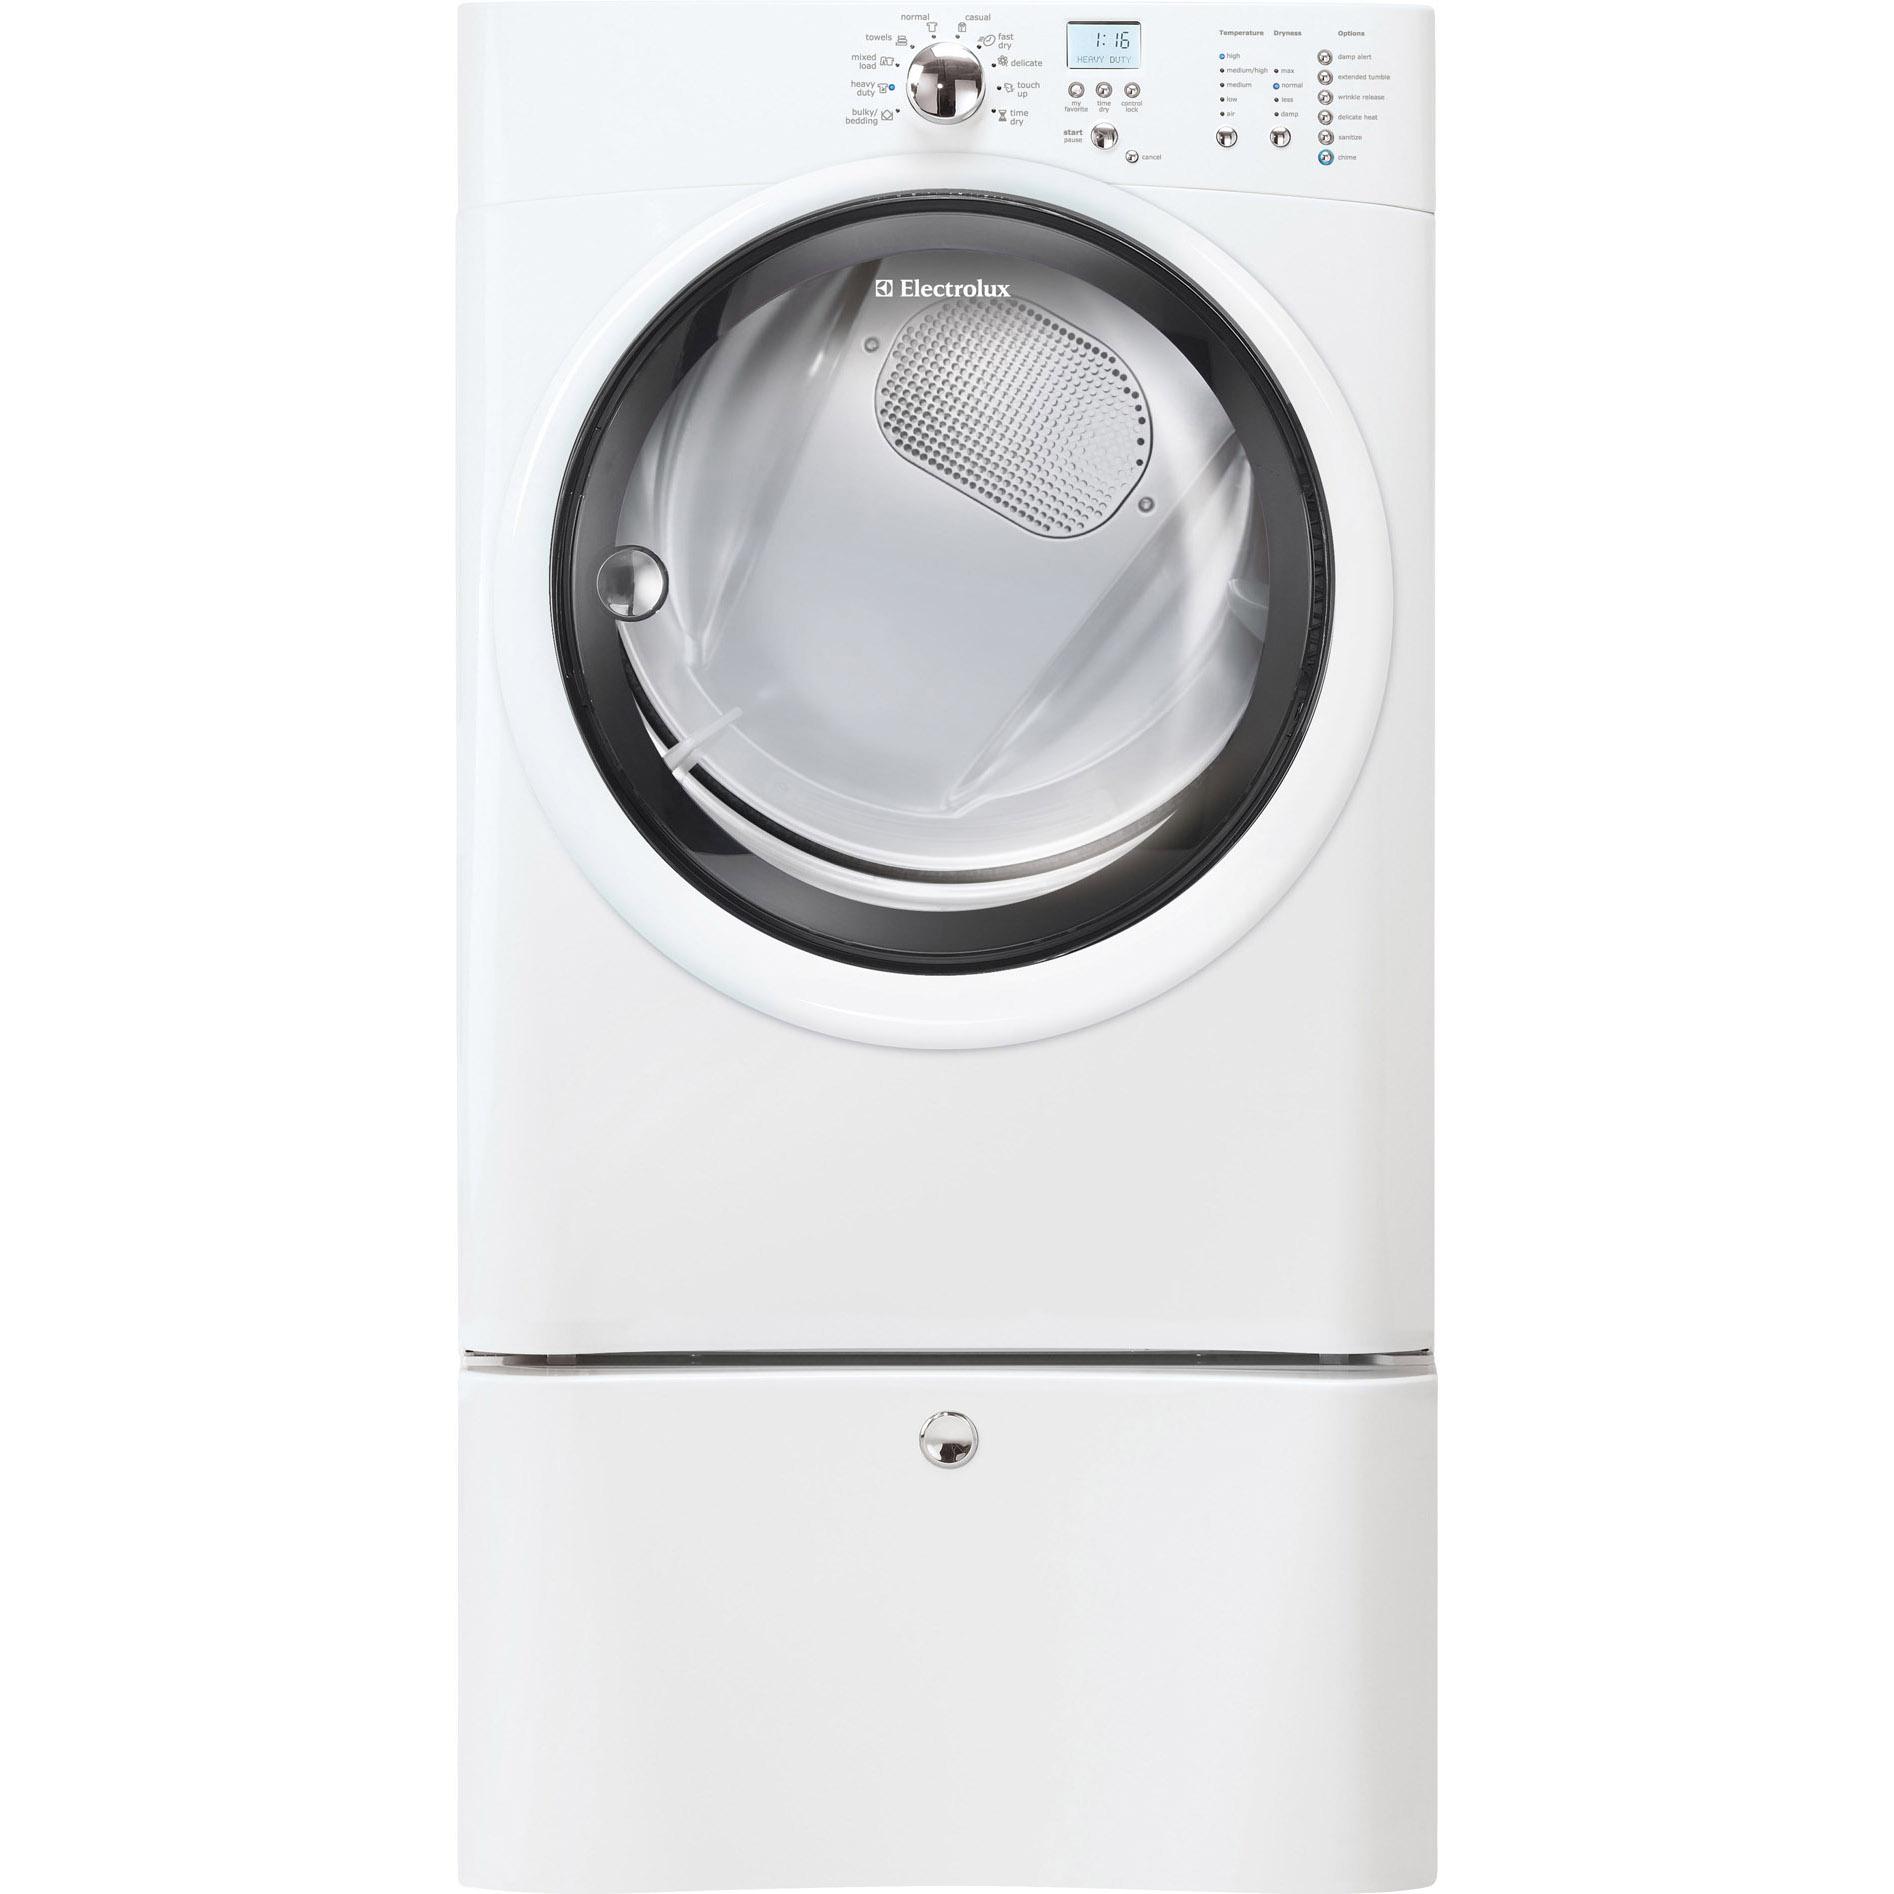 Electrolux 8.0 cu. ft. Gas Dryer w/ IQ-Touch™ Controls - Island White